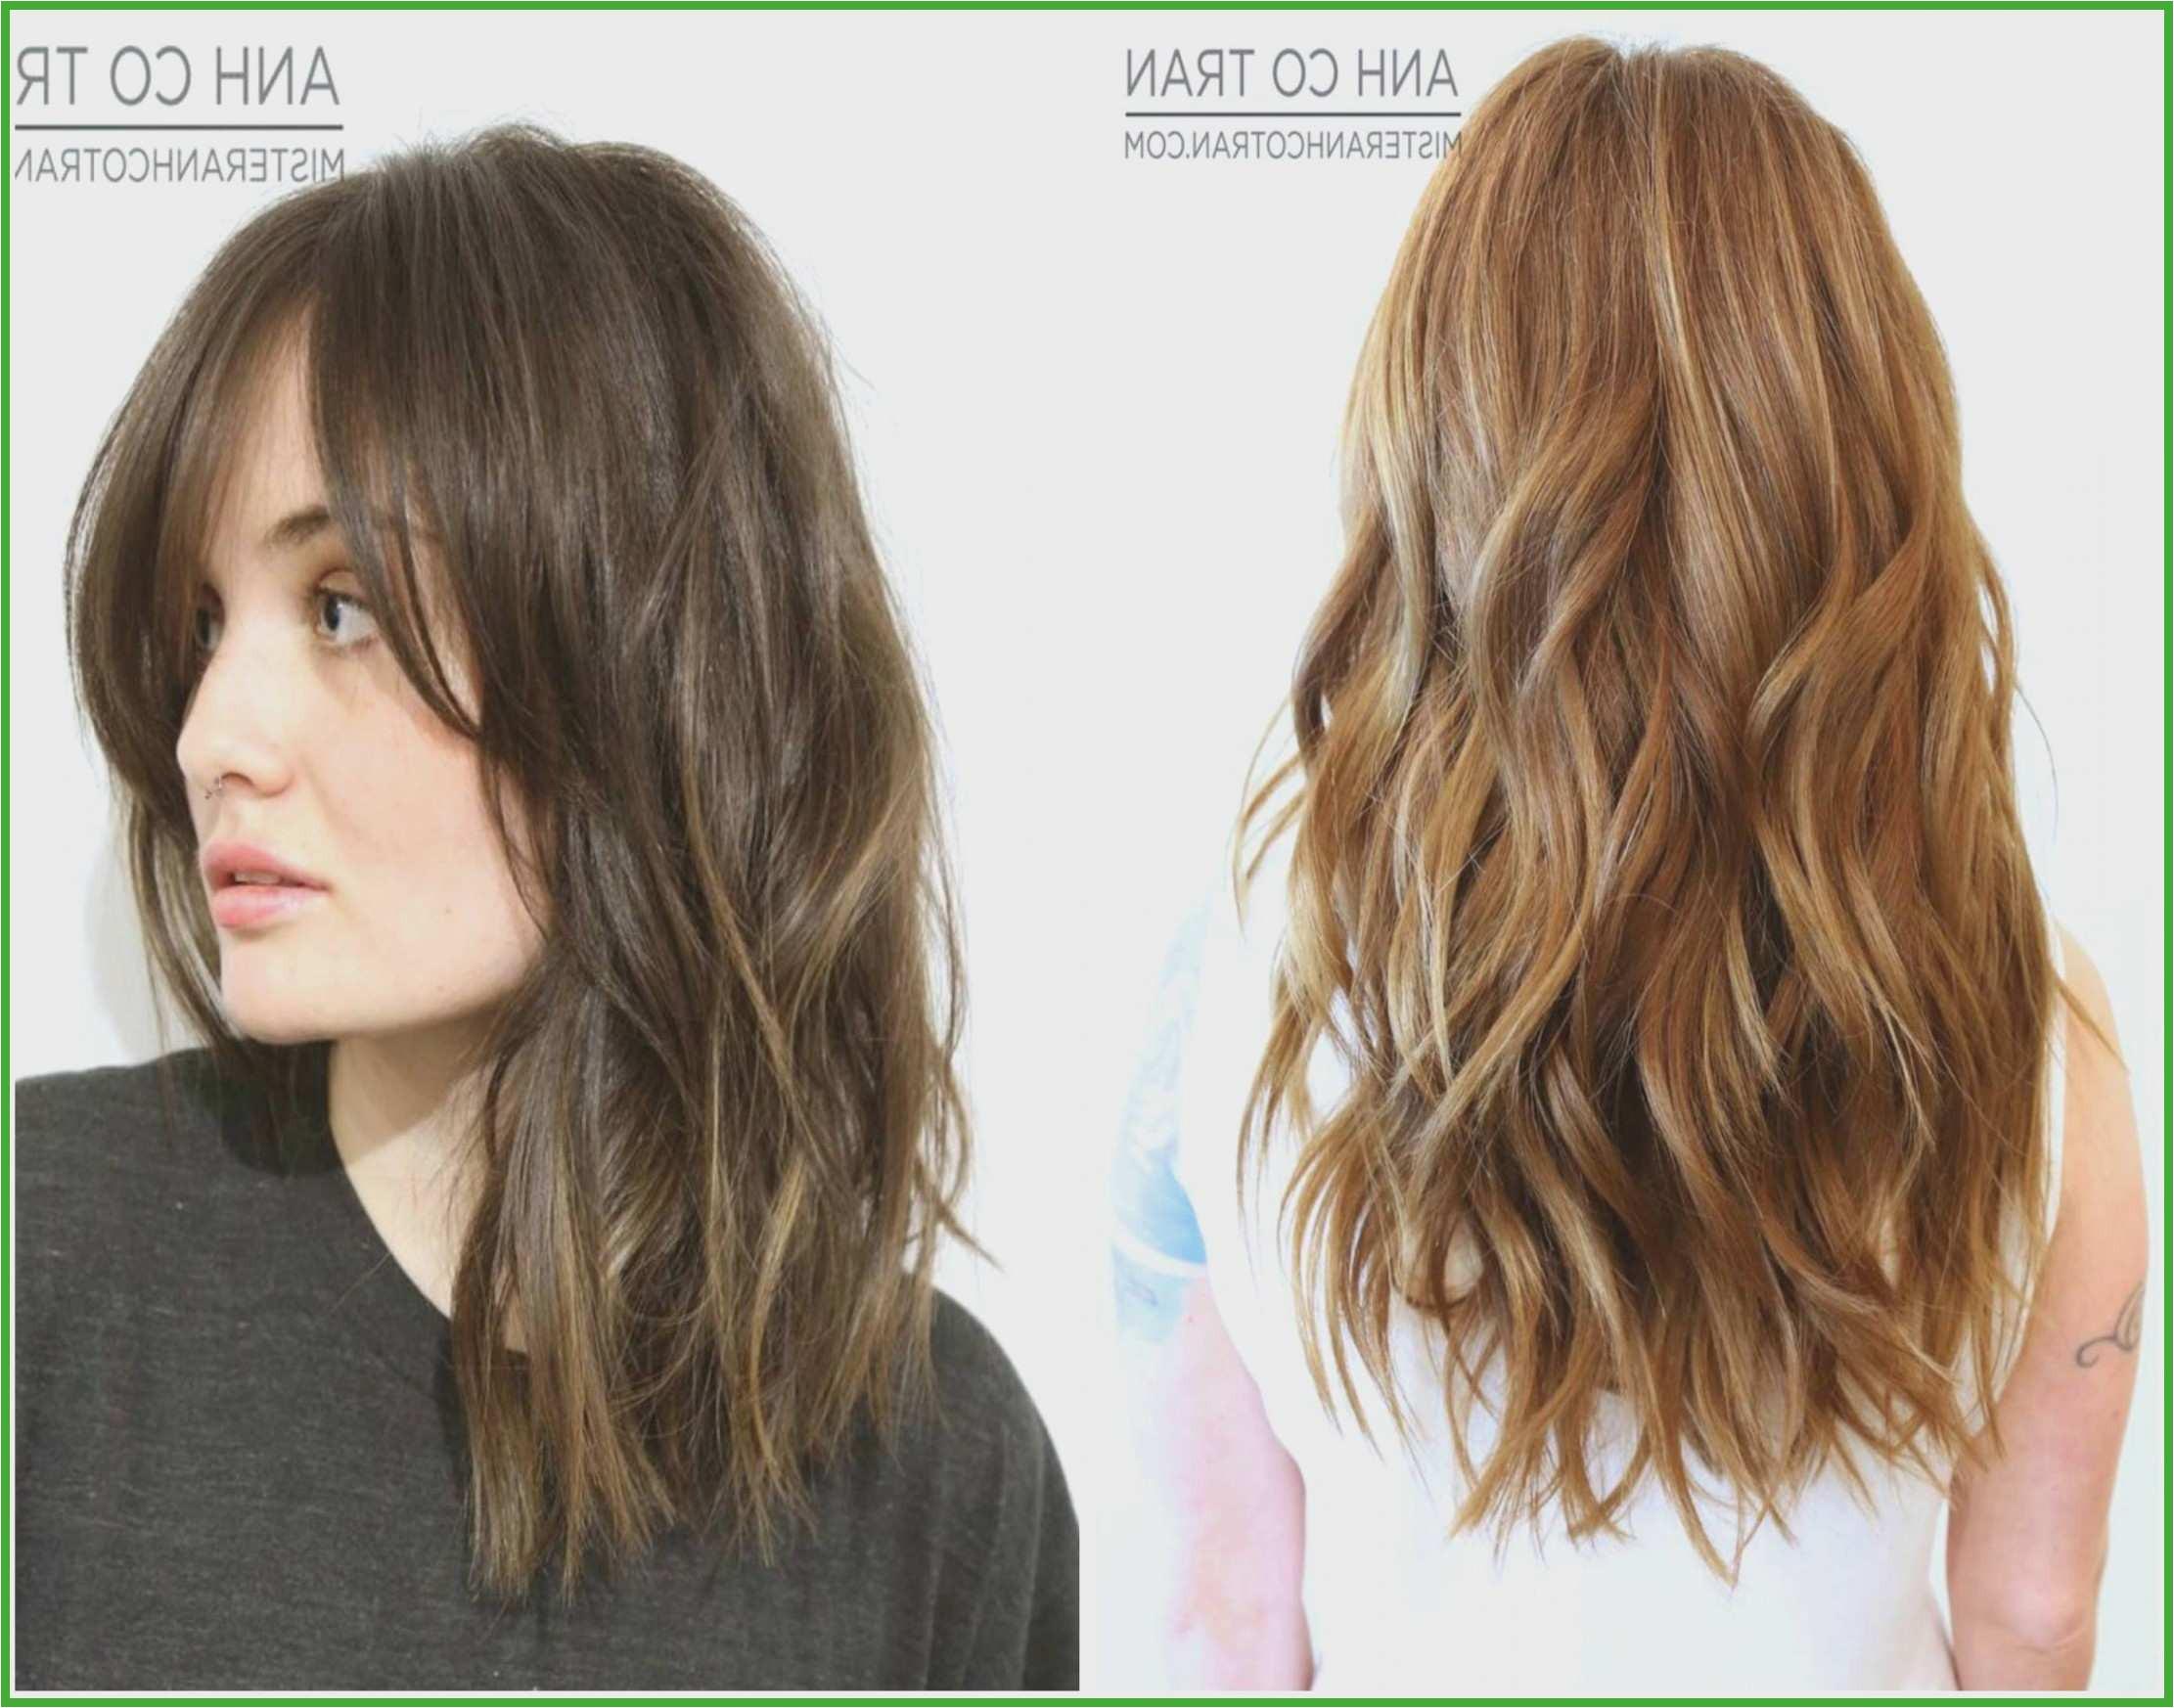 Layered asian Hair Luxury Medium Curled Hair Very Curly Hairstyles Fresh Curly Hair 0d 55